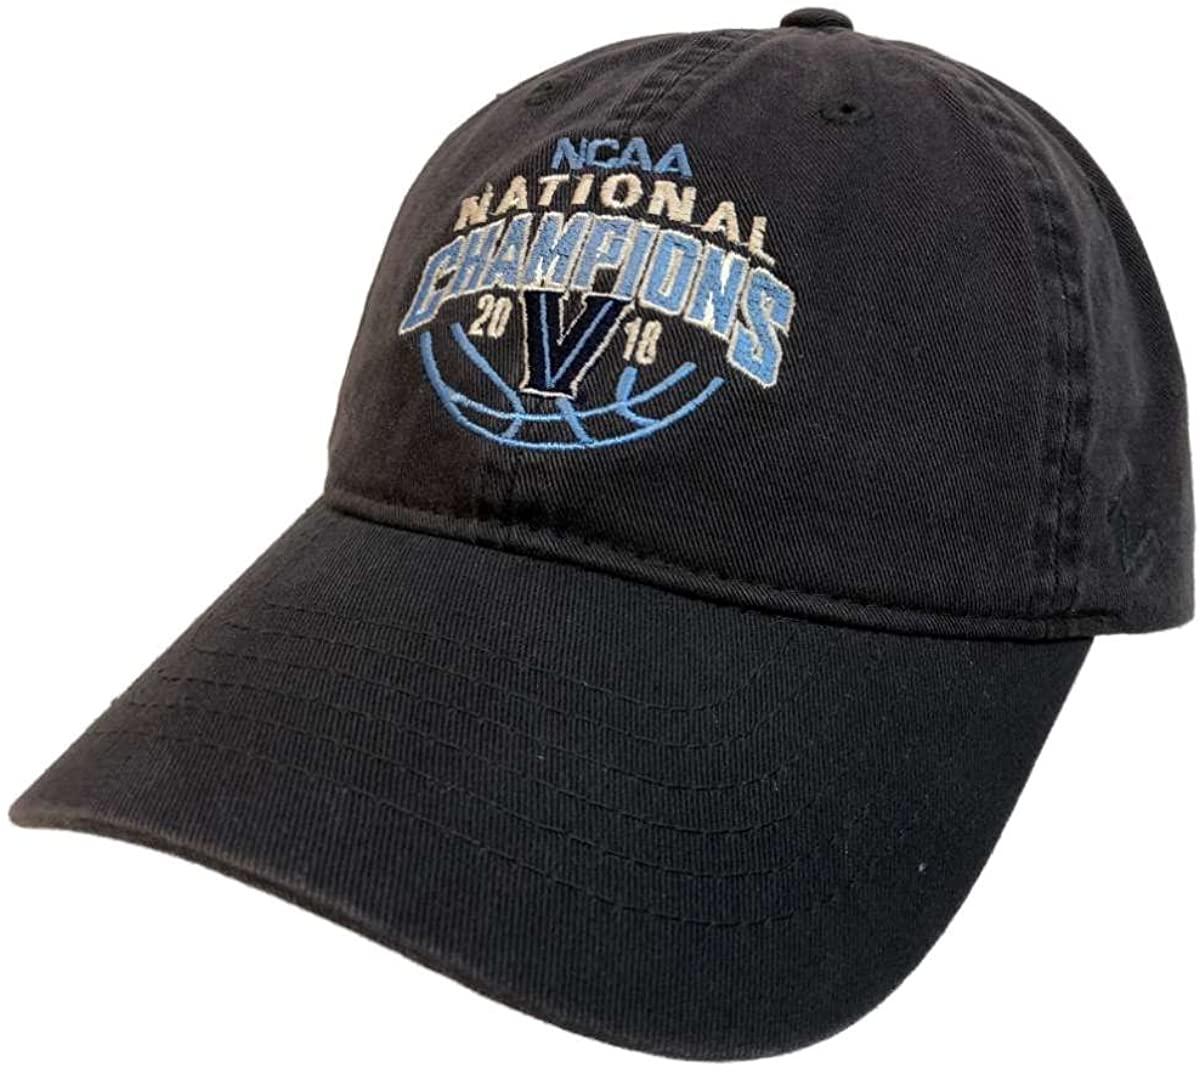 Zephyr Villanova Wildcats 2018 NCAA Men's Basketball National Champions Adj. Relax Hat